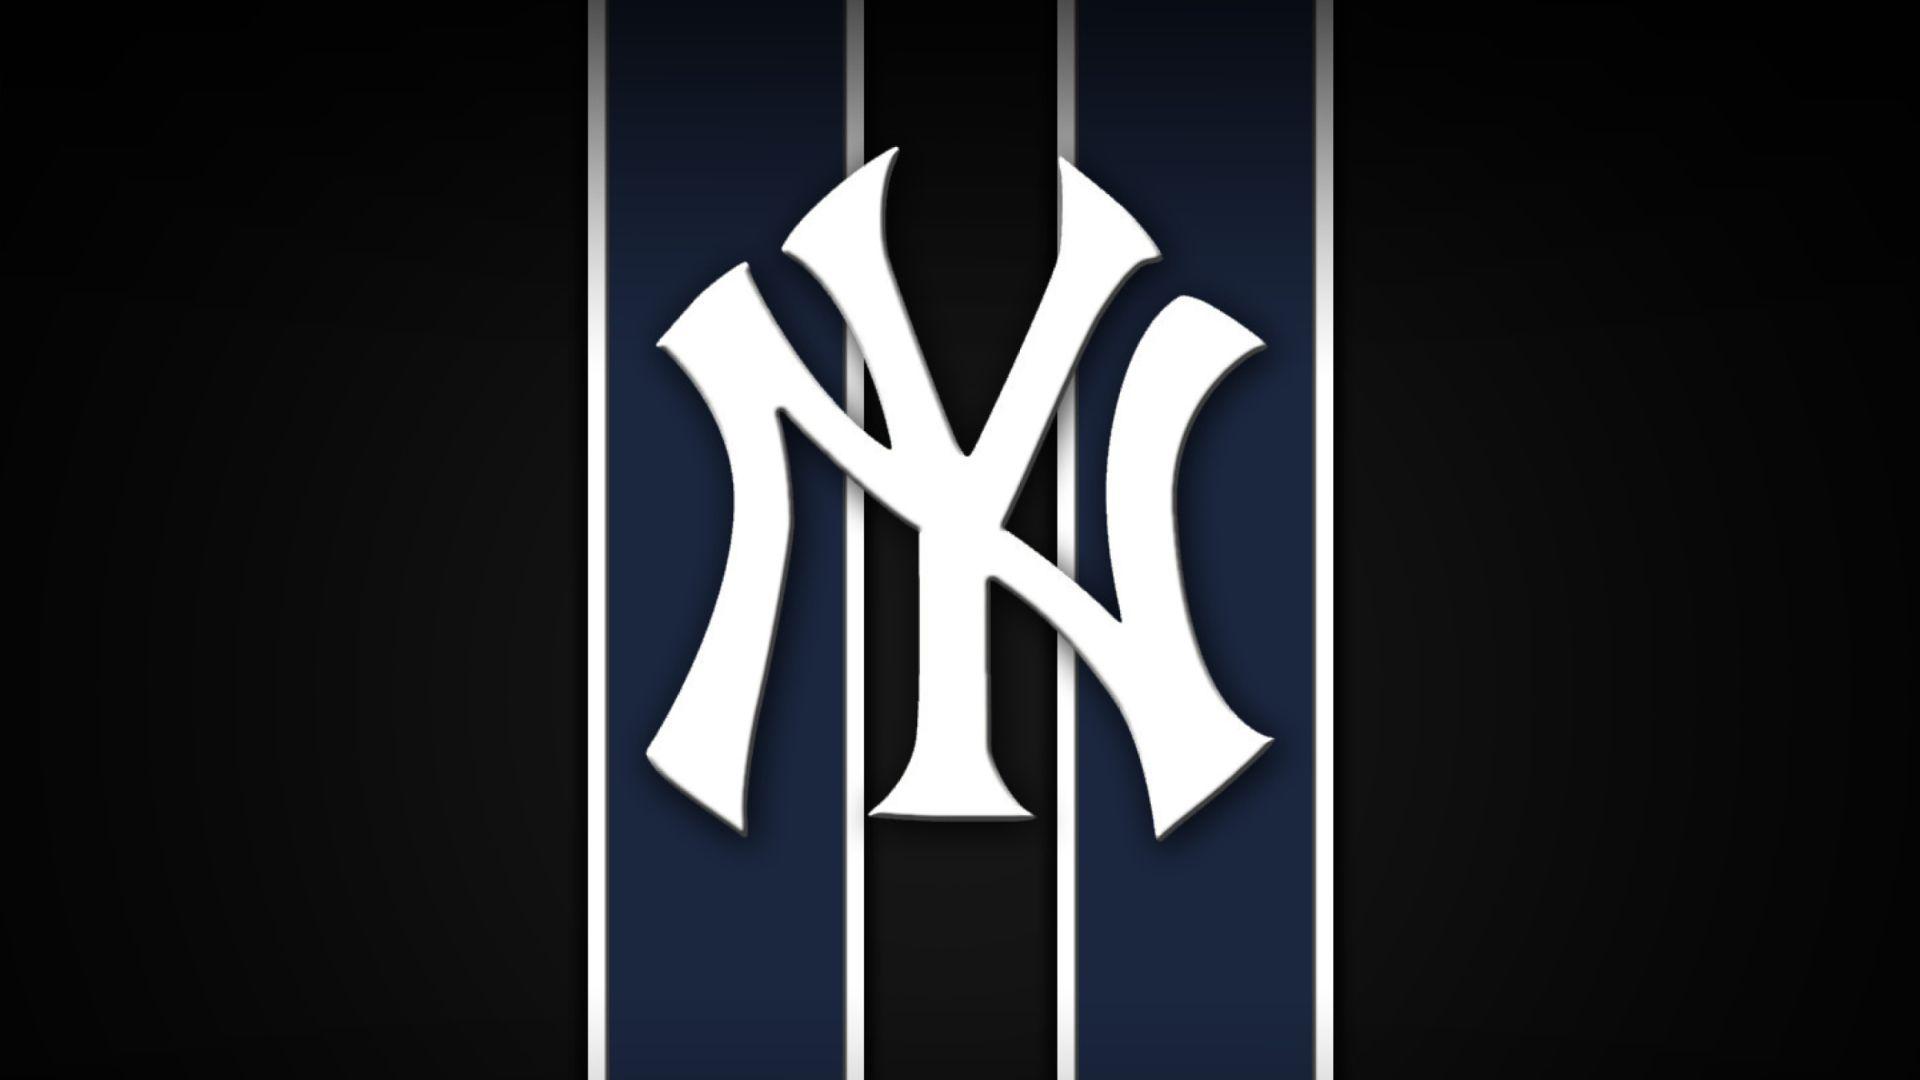 New York Yankees background computer